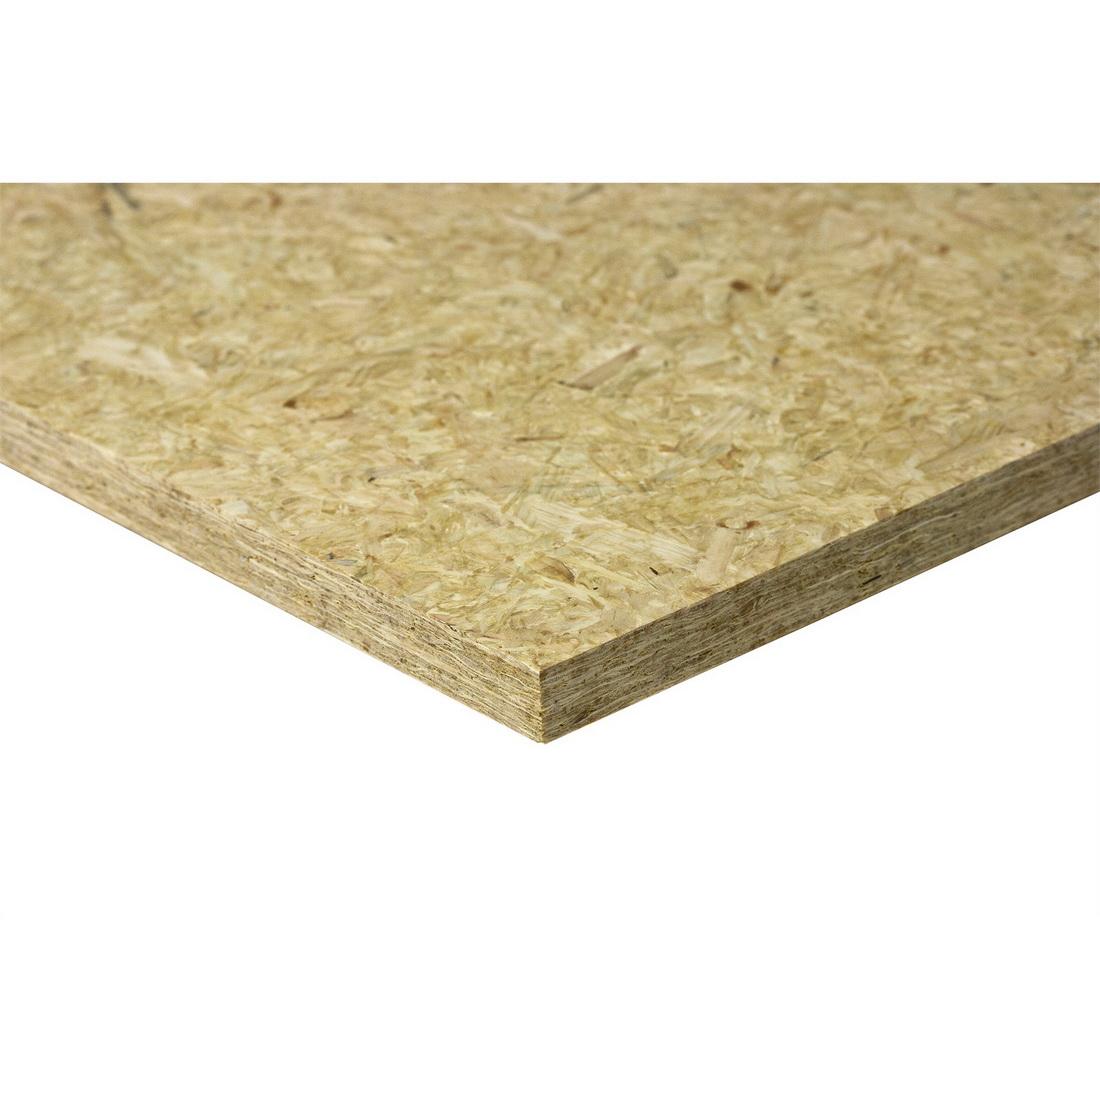 Laminex Strandfloor Square Edge Wood Panel 2400 x 1200 x 20mm Untreated 8519981